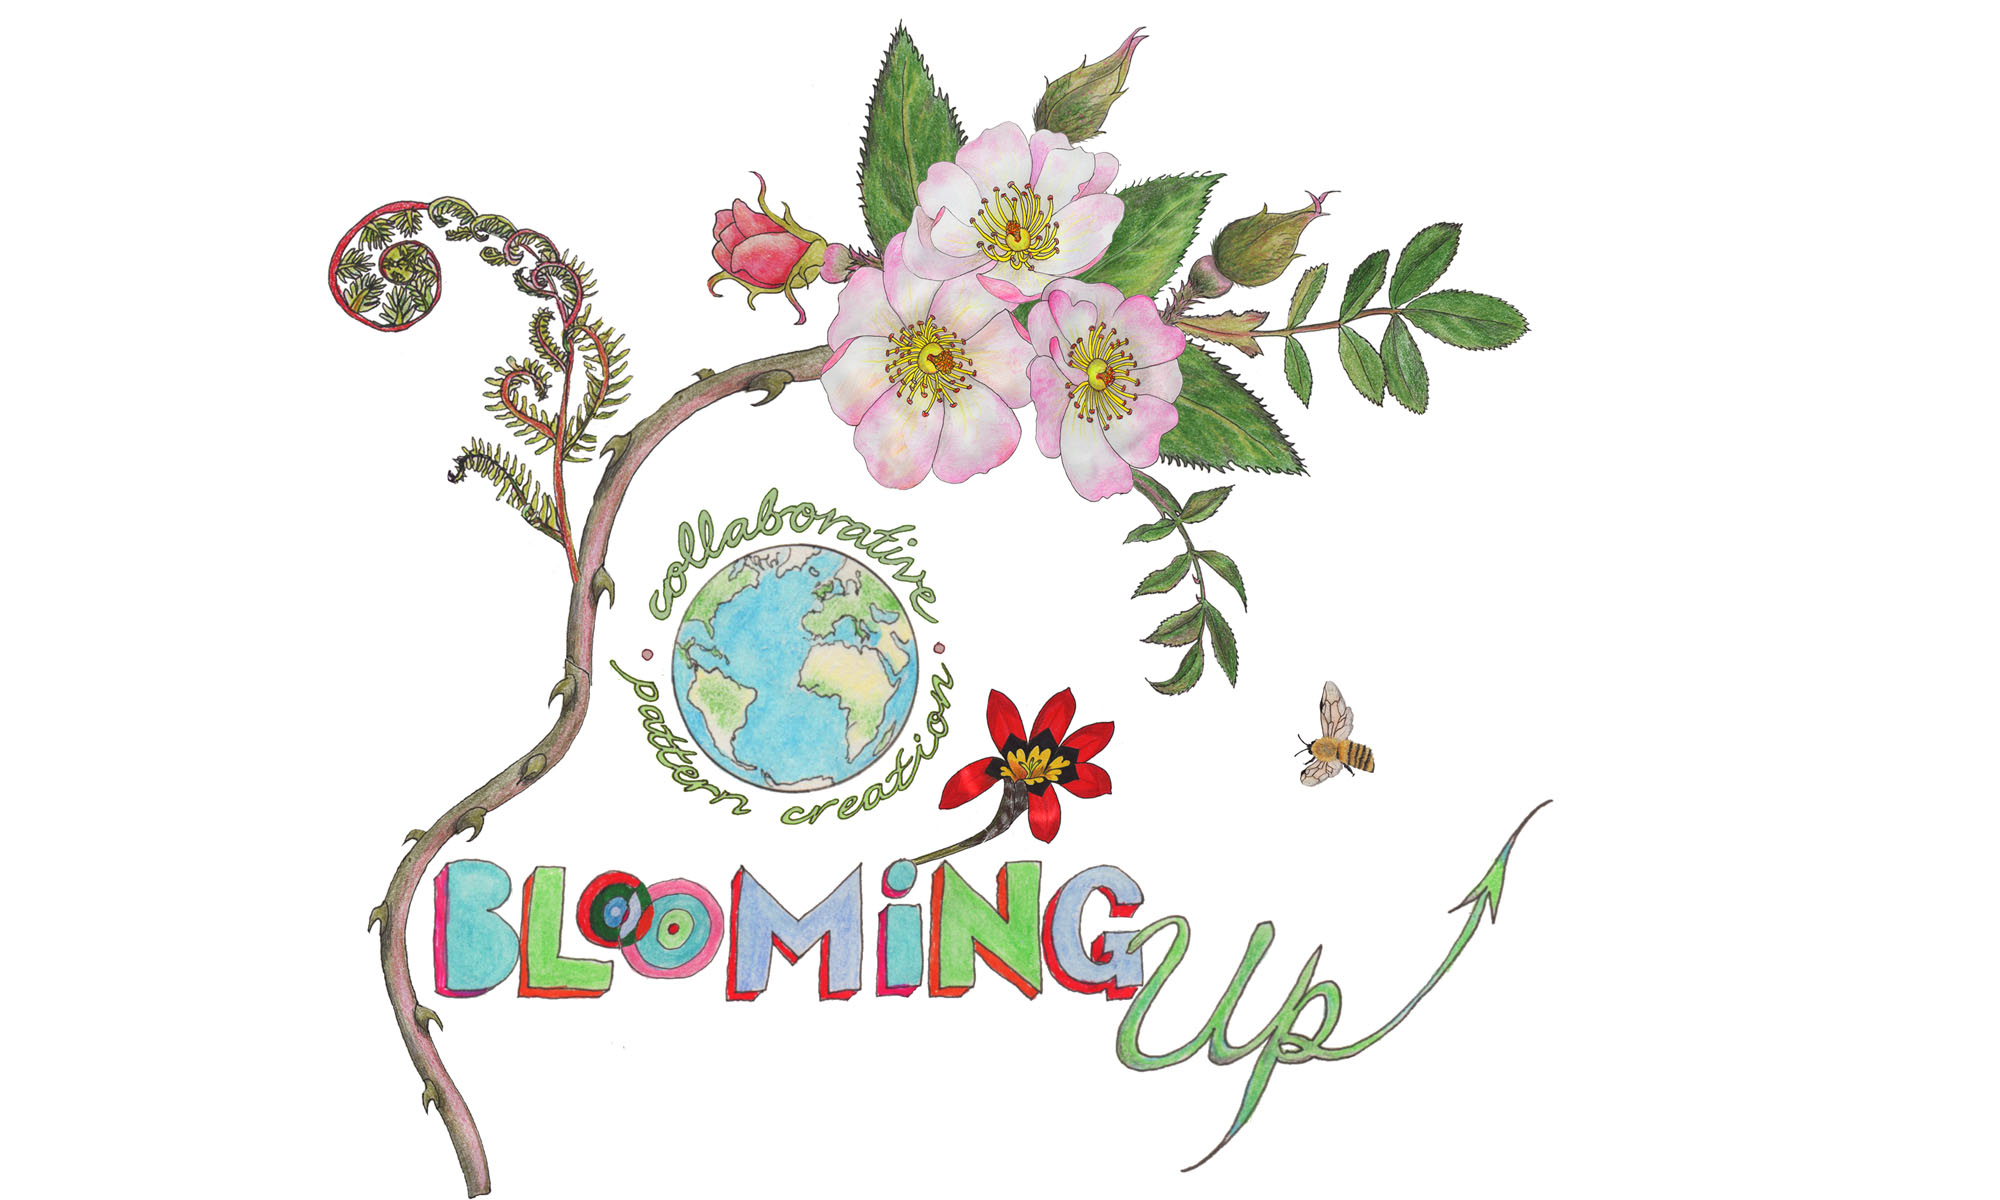 Blooming up website